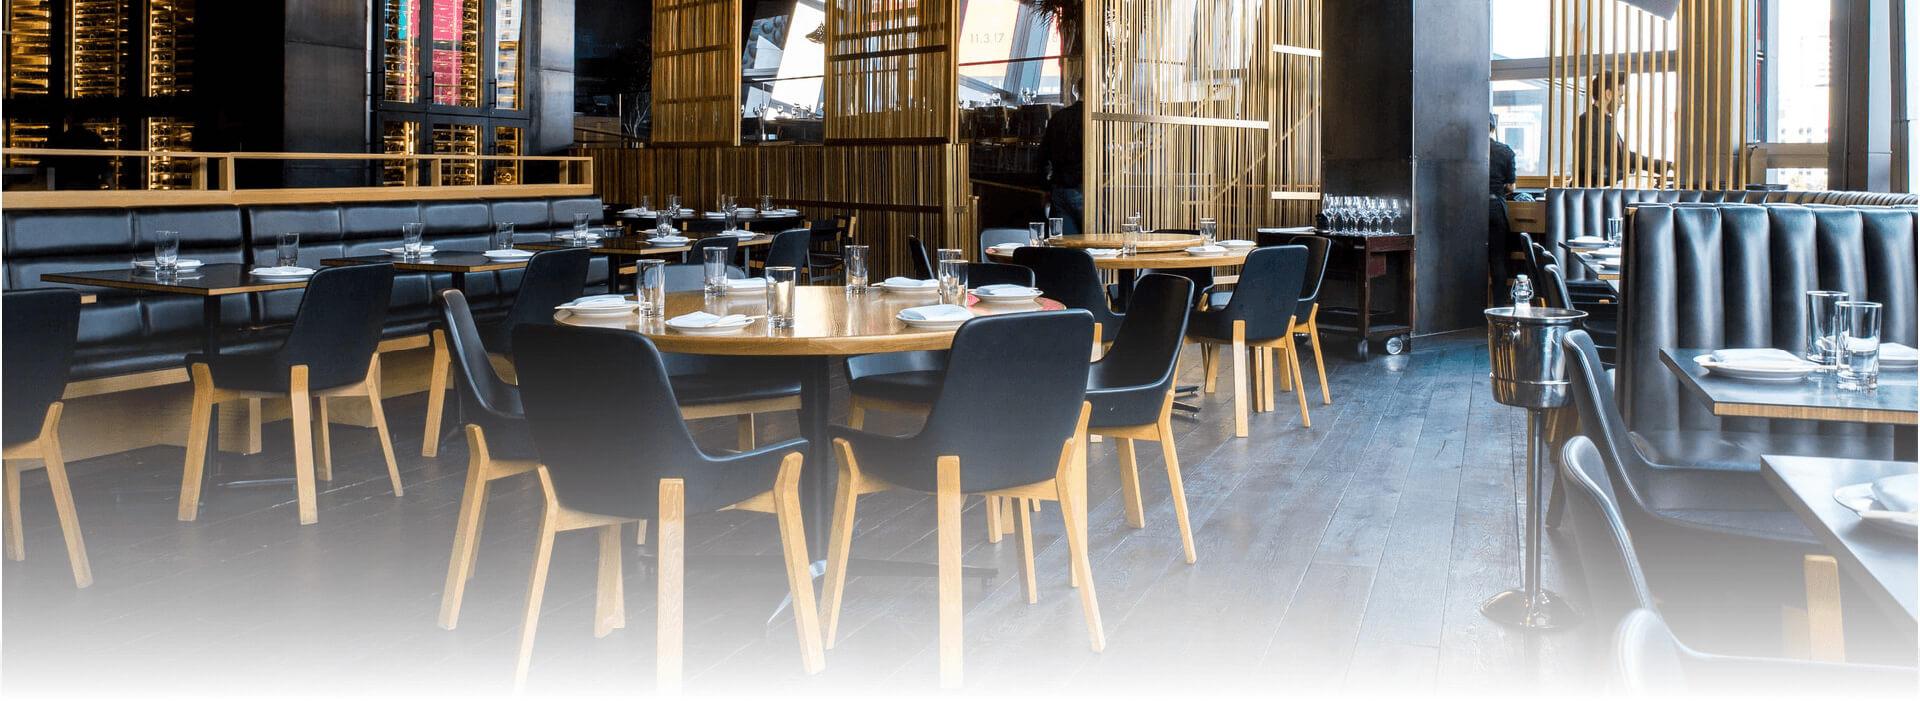 Trae-de-USA-insumos-para-restaurantes-y-negocios-de-comida - portada